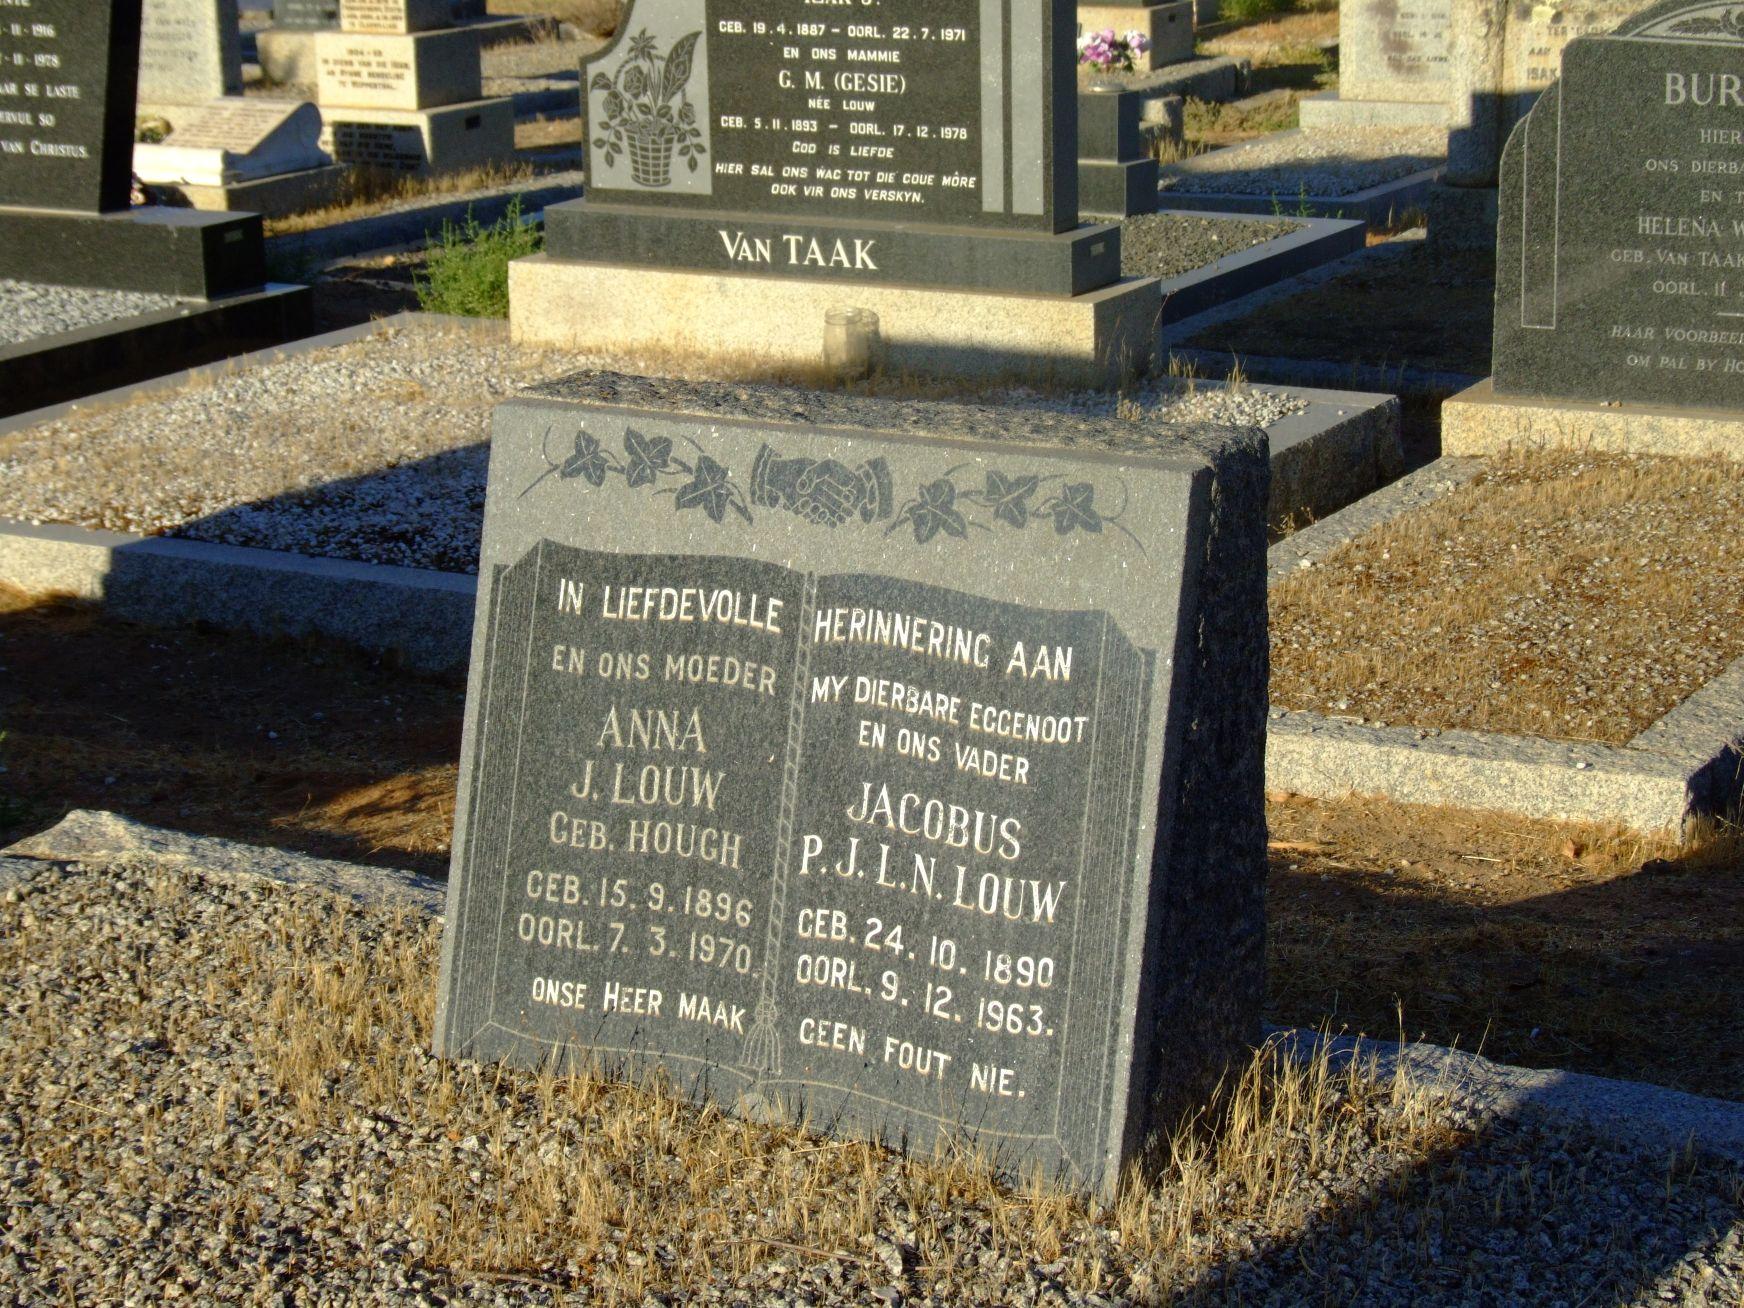 Louw, Jacobus P.J.L.N. & Anna J nee Hough